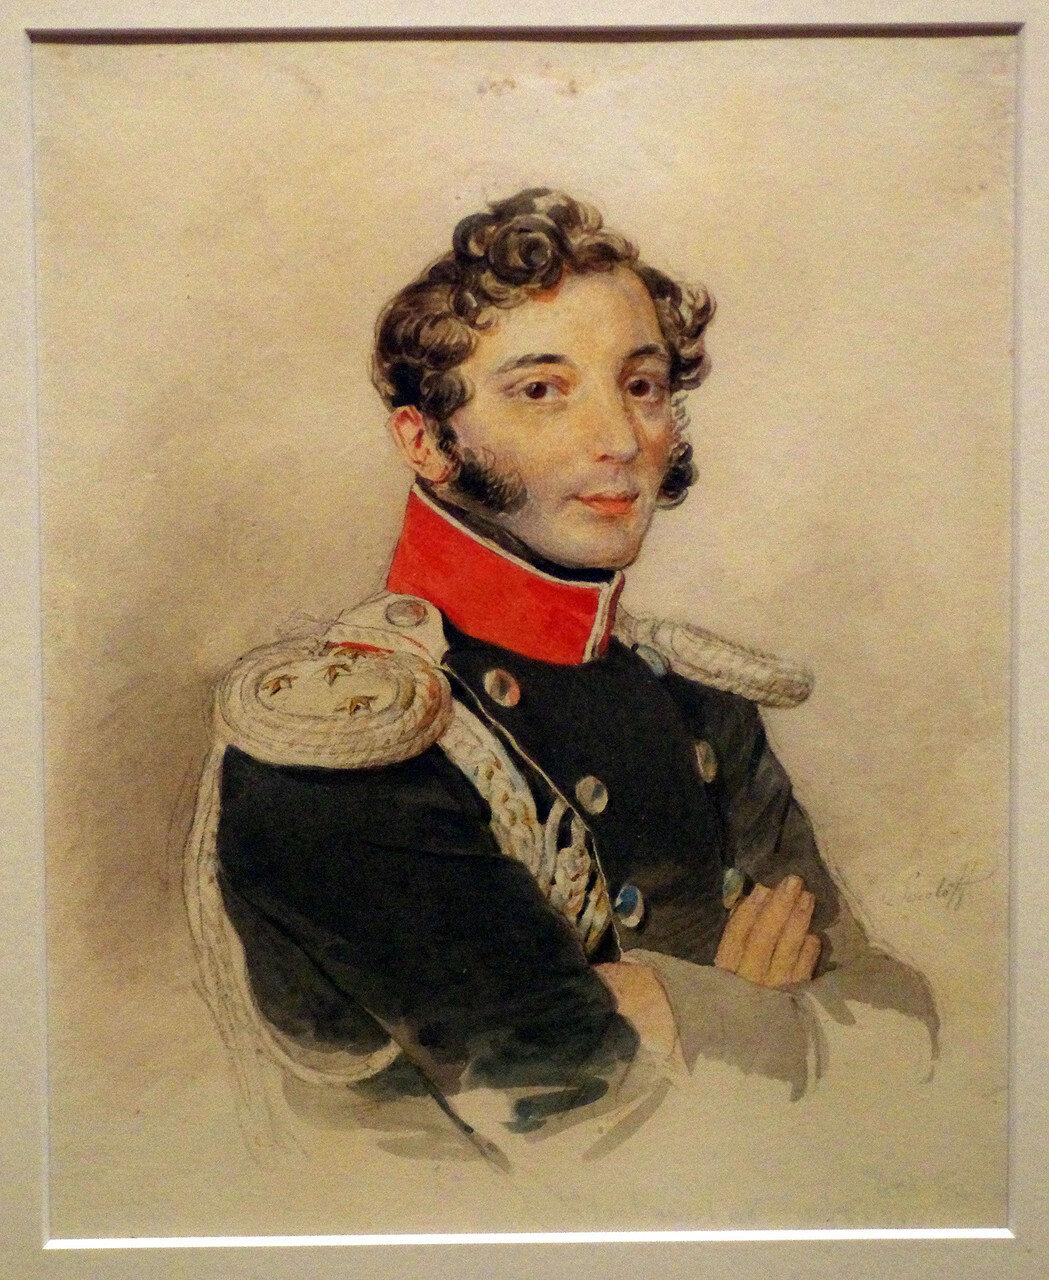 Петр Федорович Соколов. Портрет неизвестного обер-офицера. 1820-е